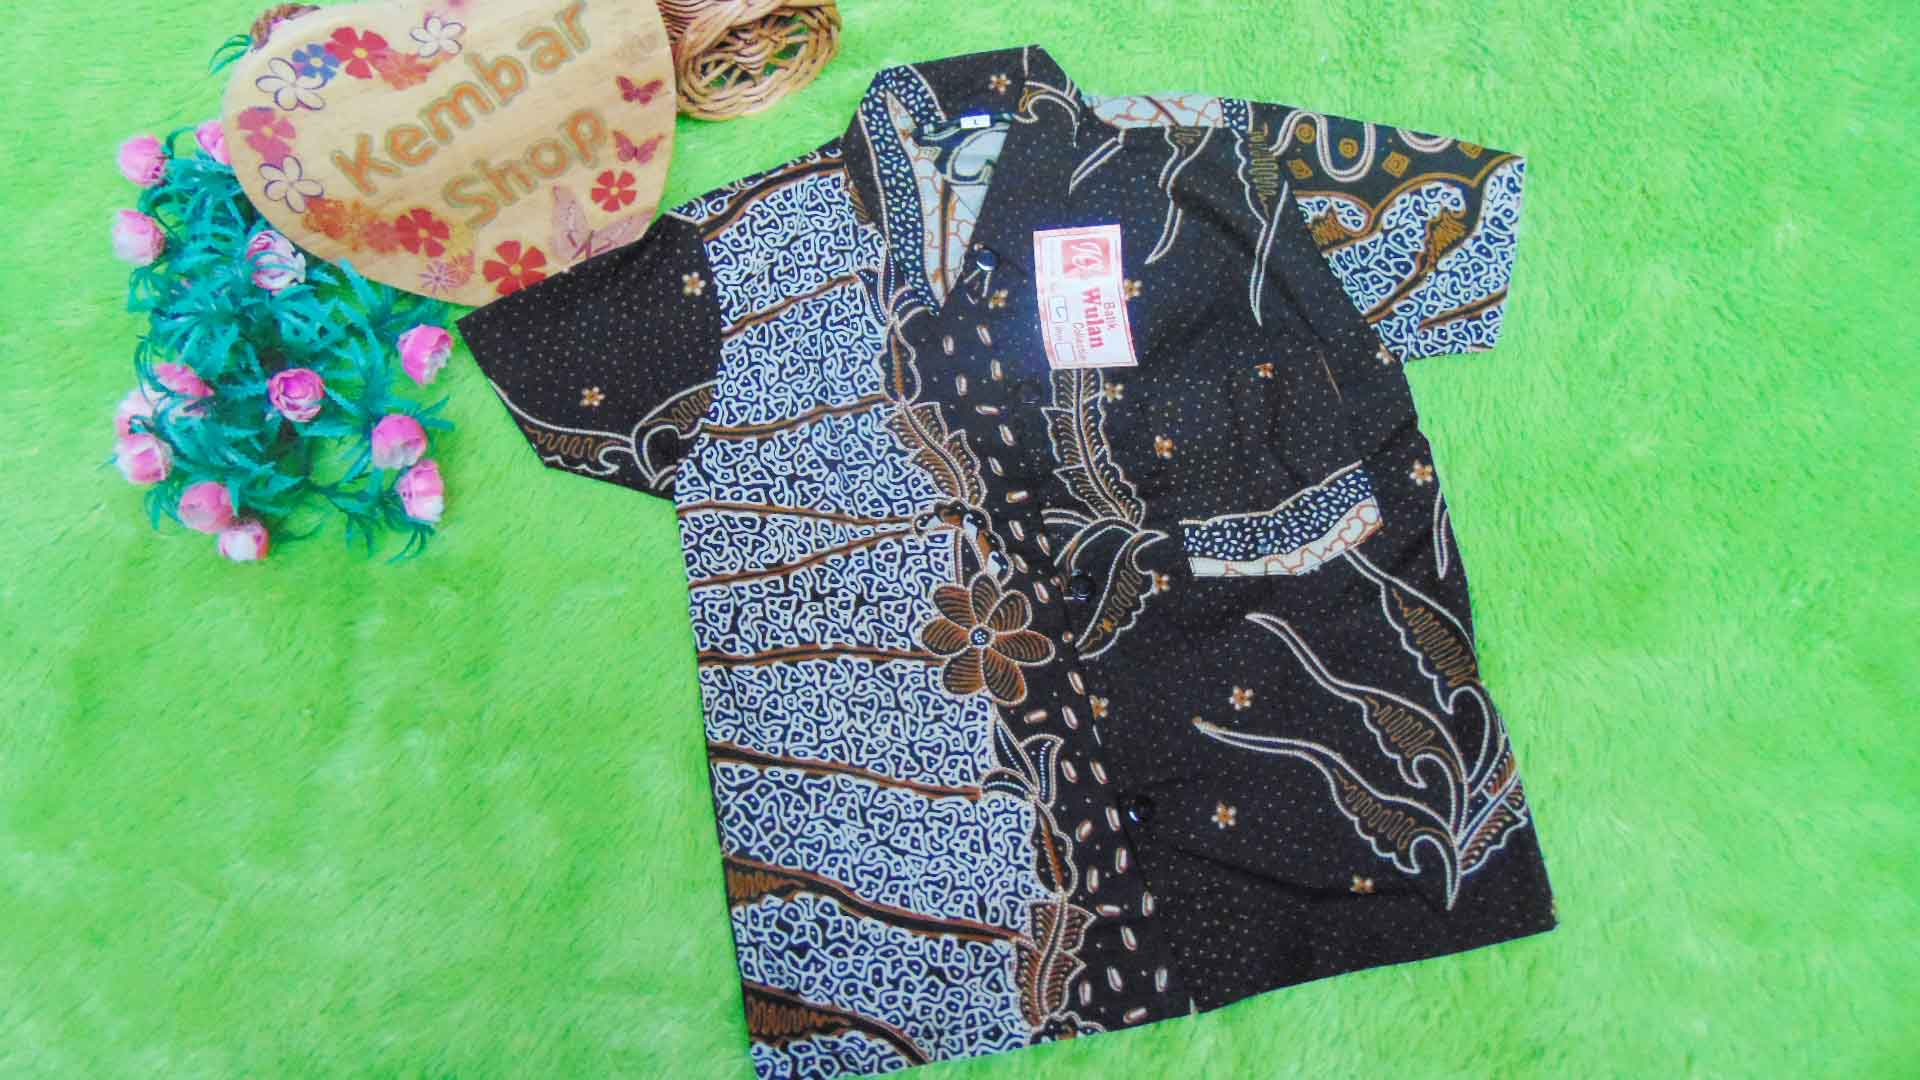 Baju batik bayi anak laki-laki kemeja batik batita hem anak cowok 2-4th baju pesta motif mozaik